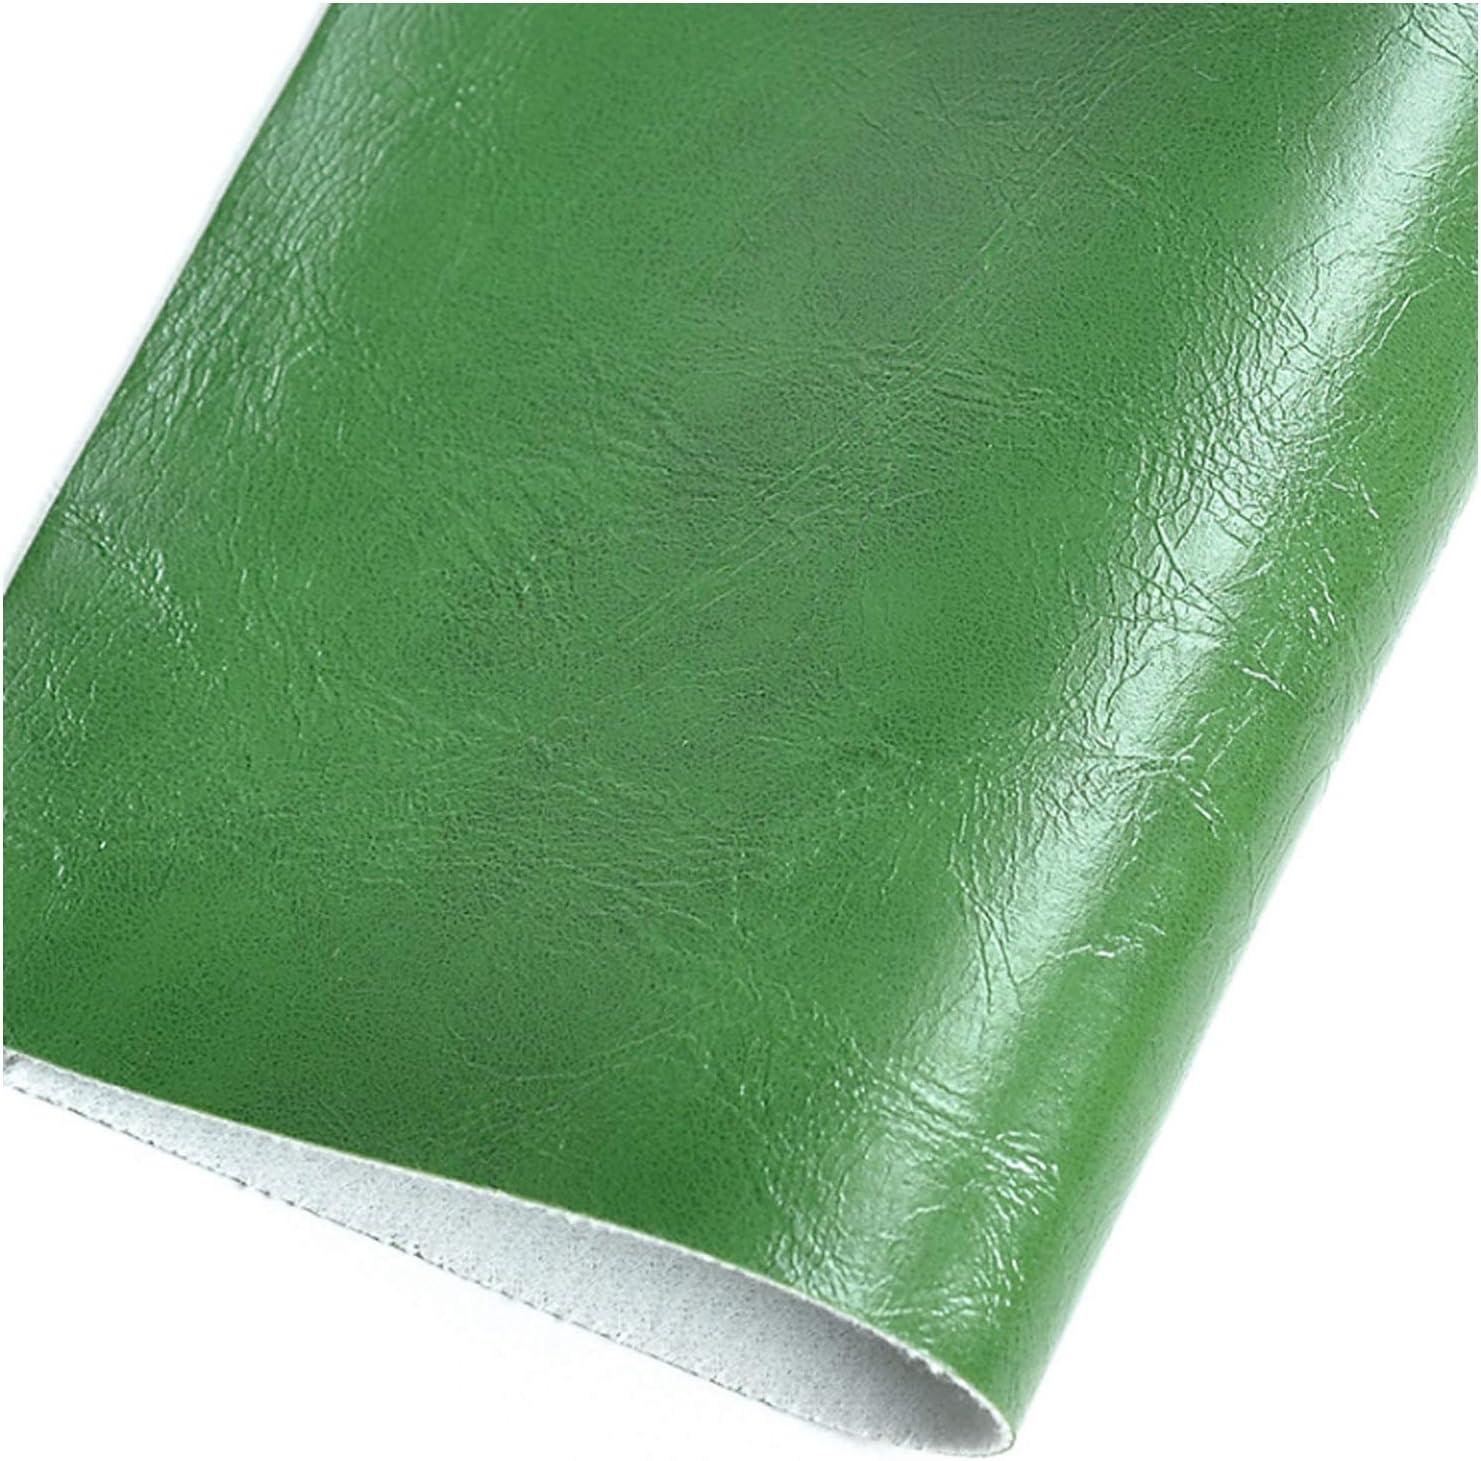 Leather Hide Faux Ranking TOP2 Leatherette Minneapolis Mall W Oil 138cm Width